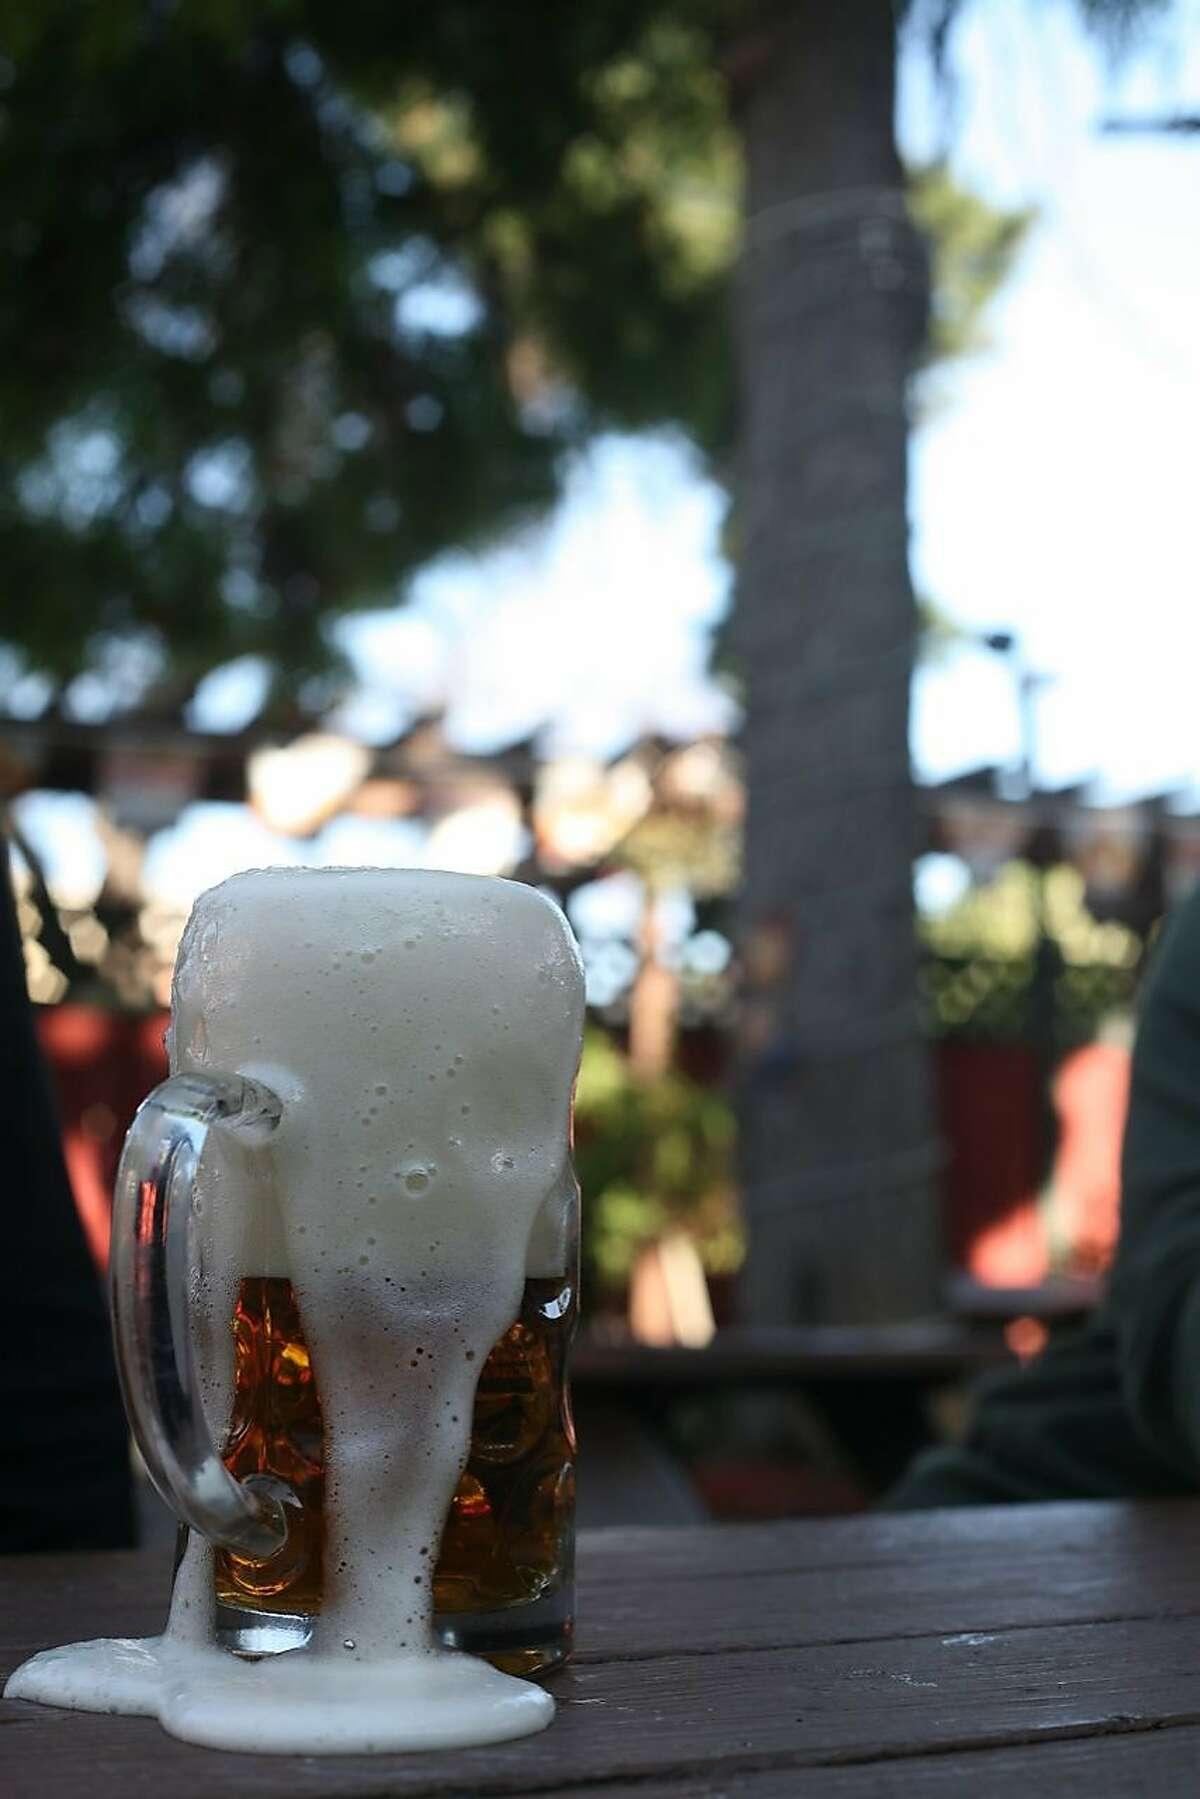 Not as impressed at Oasis Beer Garden in Menlo Park.